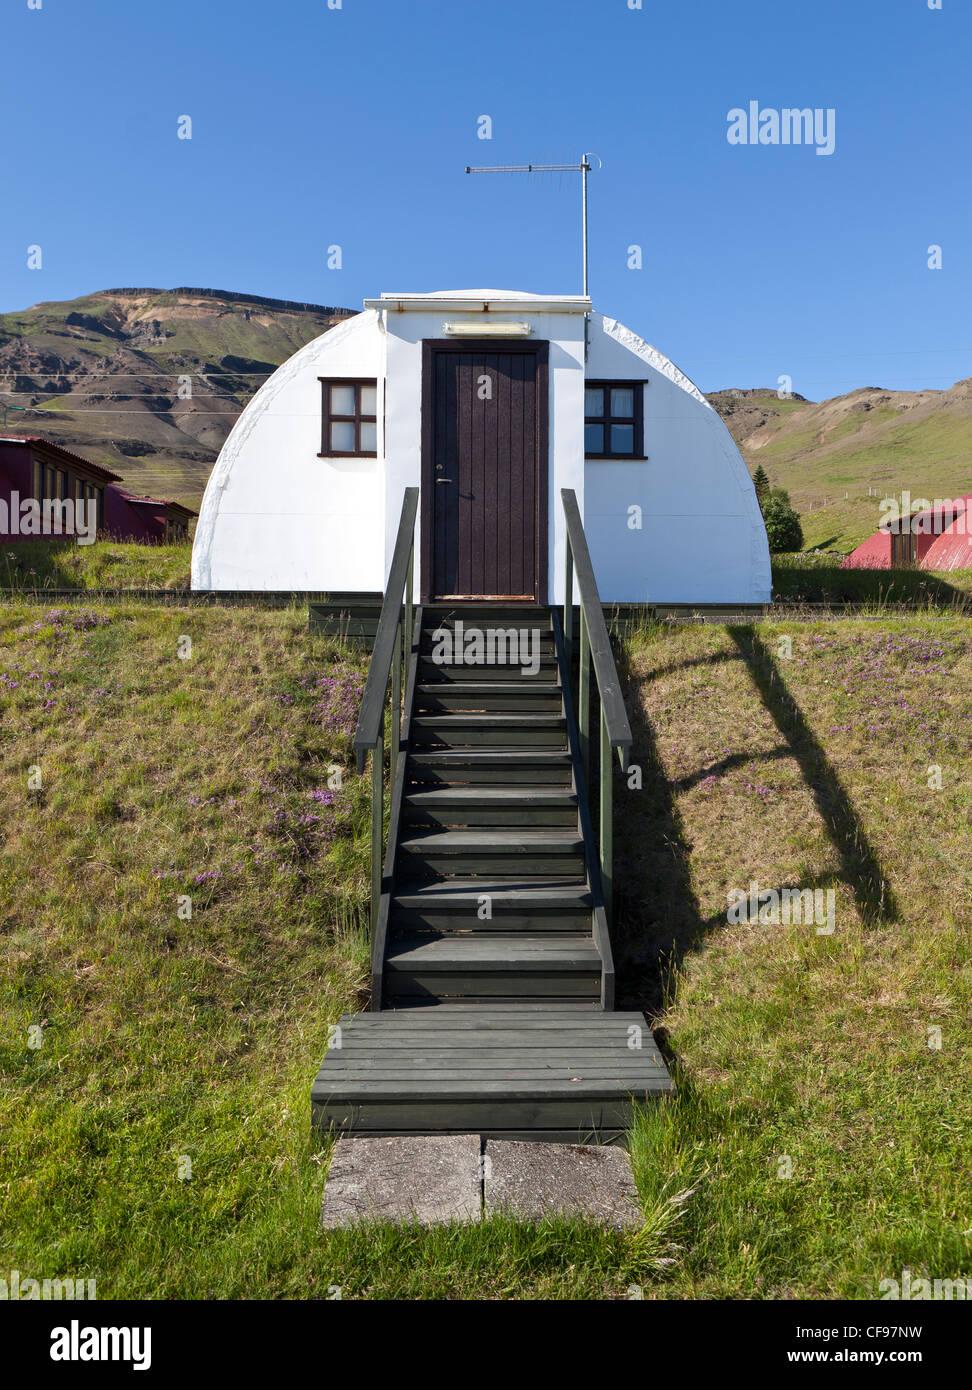 Alte Armee umgewandelt Kaserne, Sommerhäuser, Hvalfjordur, Island Stockbild